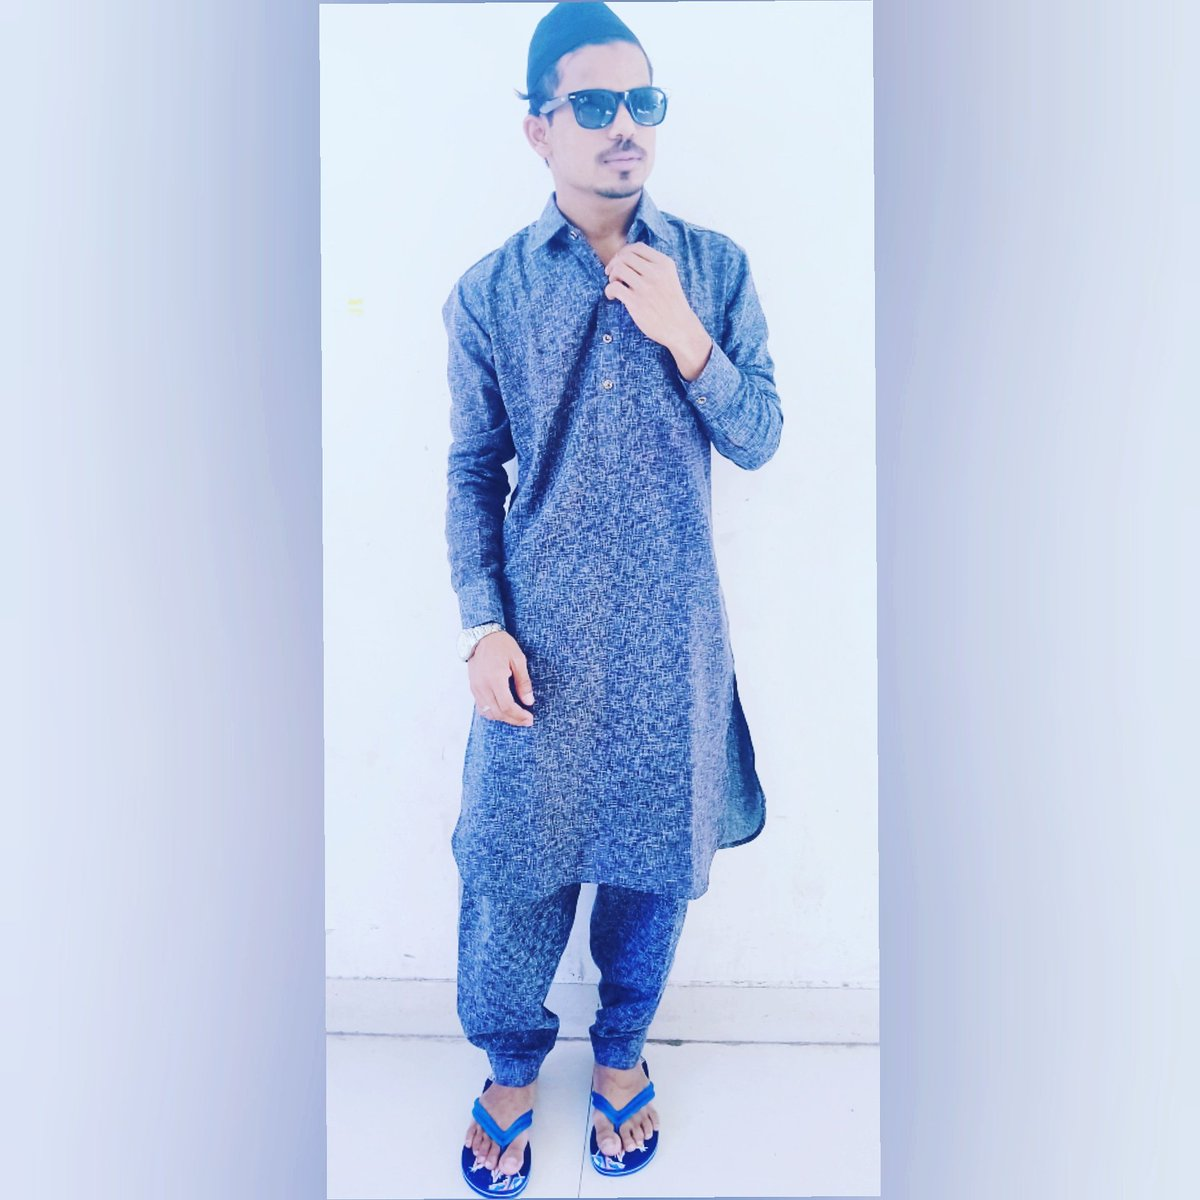 Eid mubarak all of you.#viral #explorepage #explore #trending #like #tiktok #follow #instagram #love #indonesia #likeforlikes #viralvideos #instagood #music #likes #followforfollowback #lfl #memes #repost #d #dance #video #funny #jakarta #meme #dagelan #malaysia #fashion #youtube